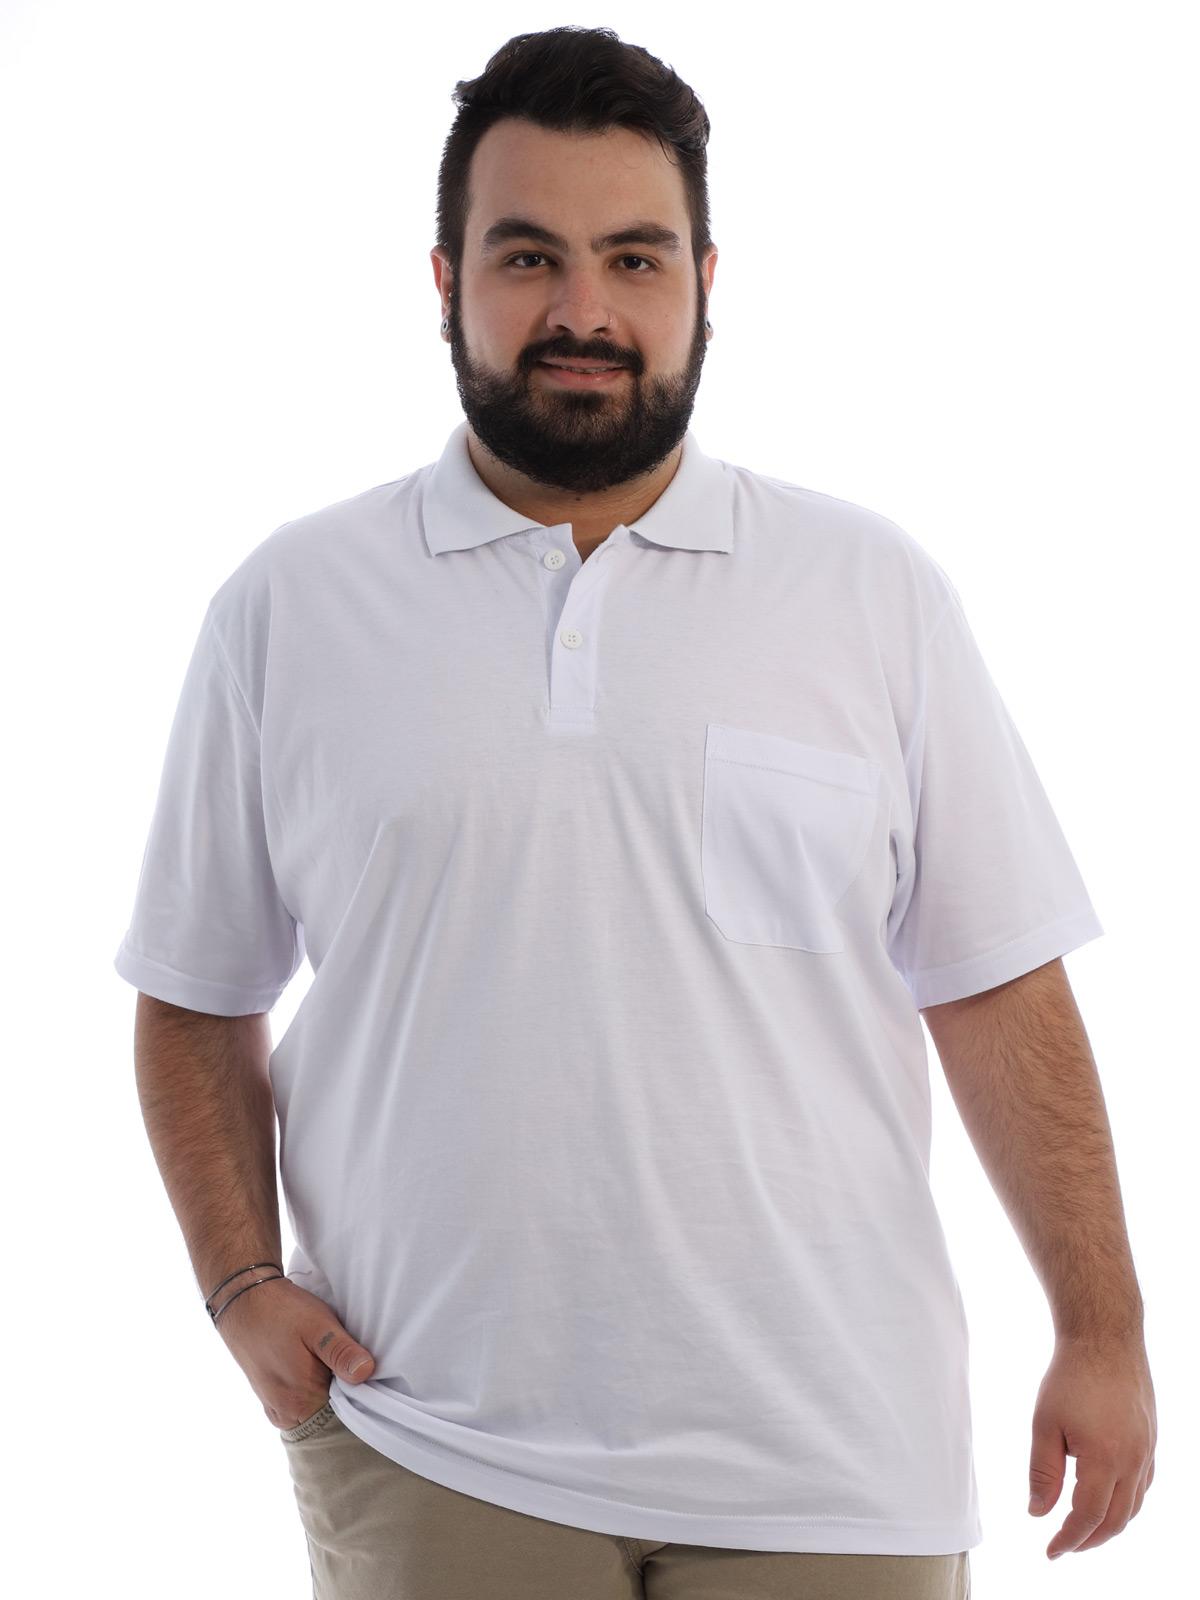 Camisa Polo Plus Size Masculina com Bolso Basica Branco